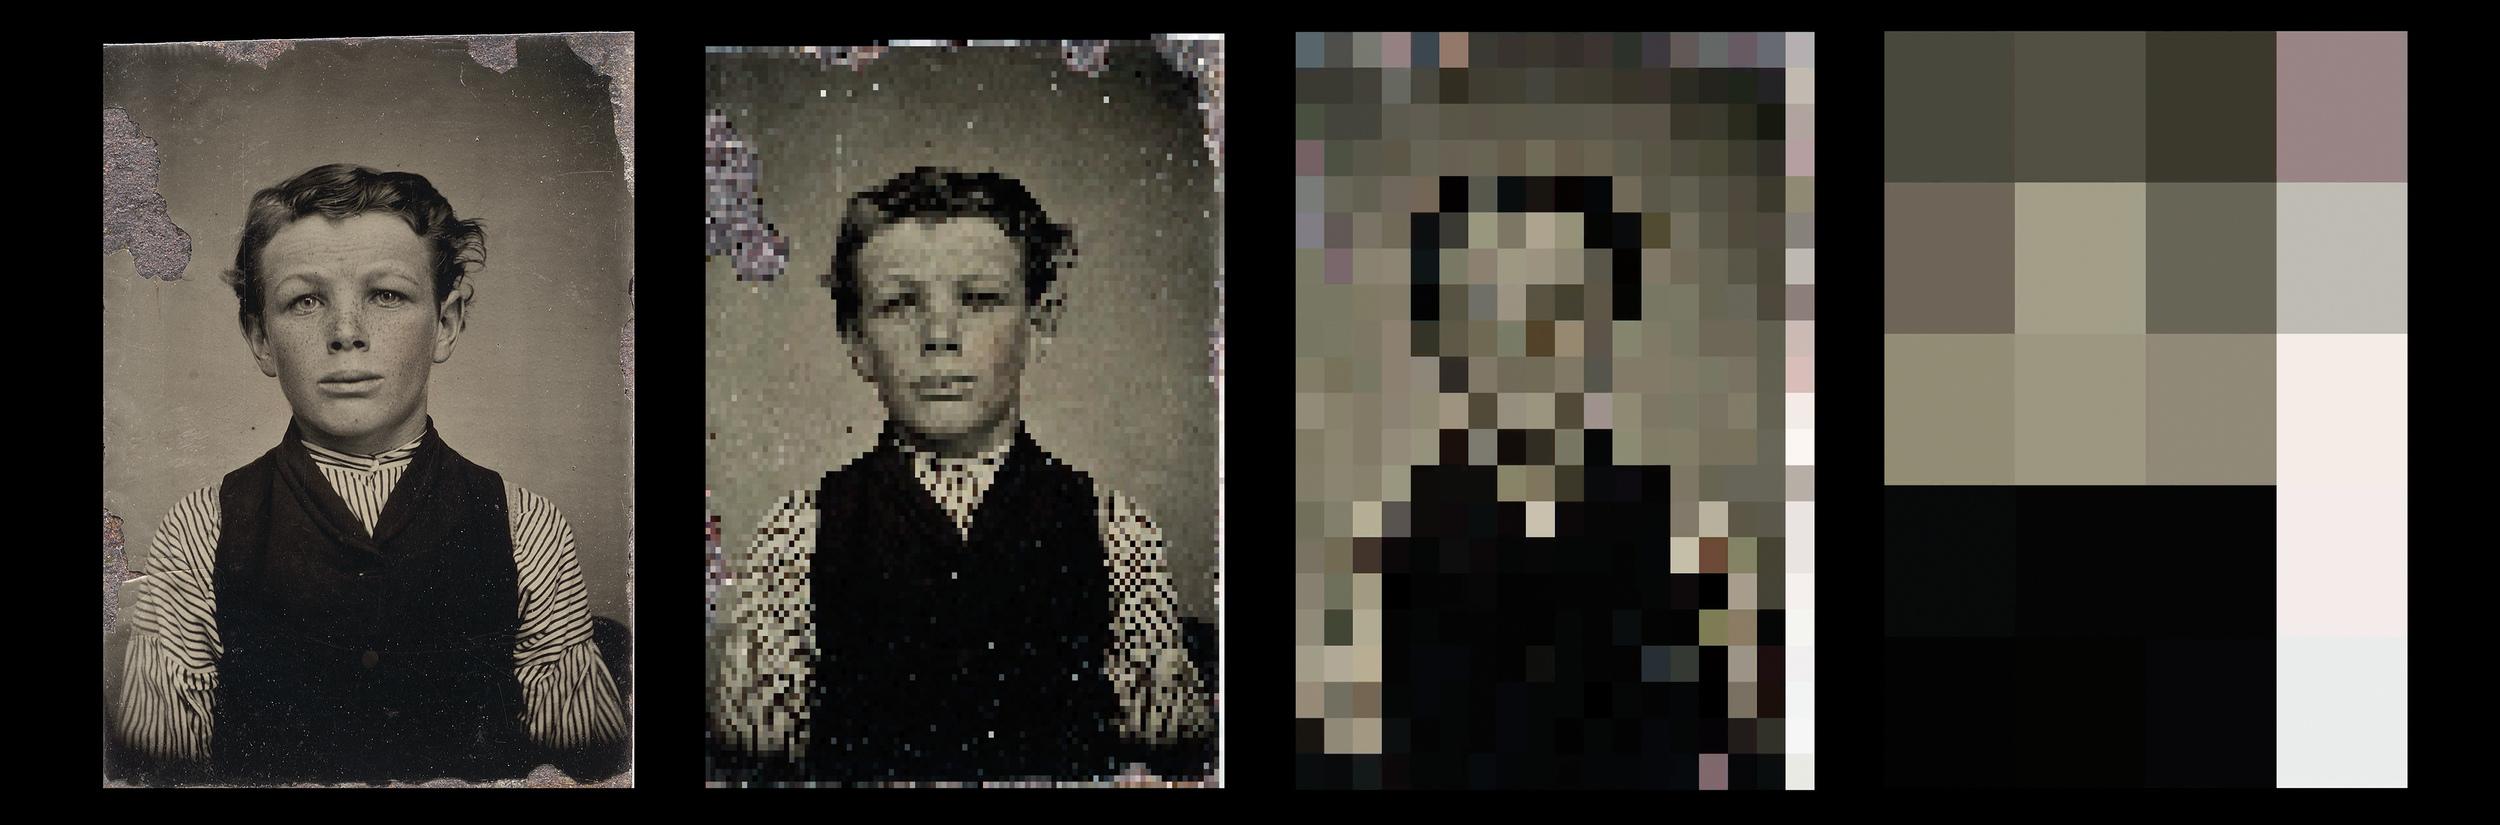 Tintype boy progression still.jpg